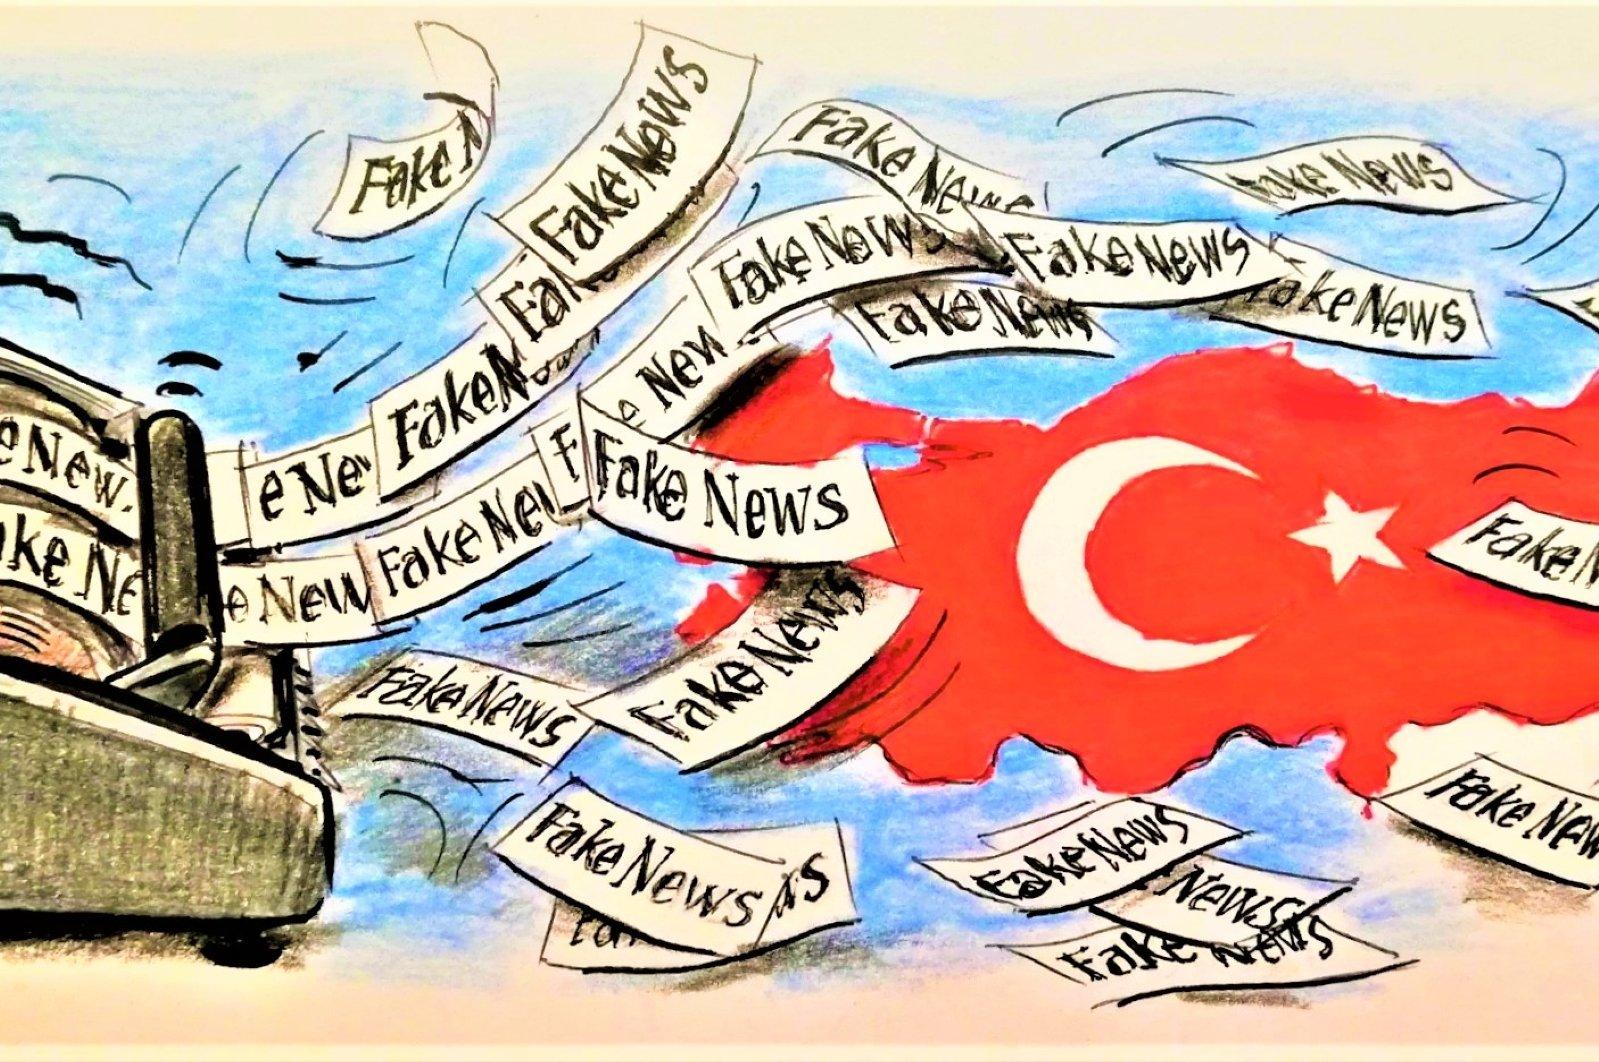 An illustration by Erhan Yalvaç